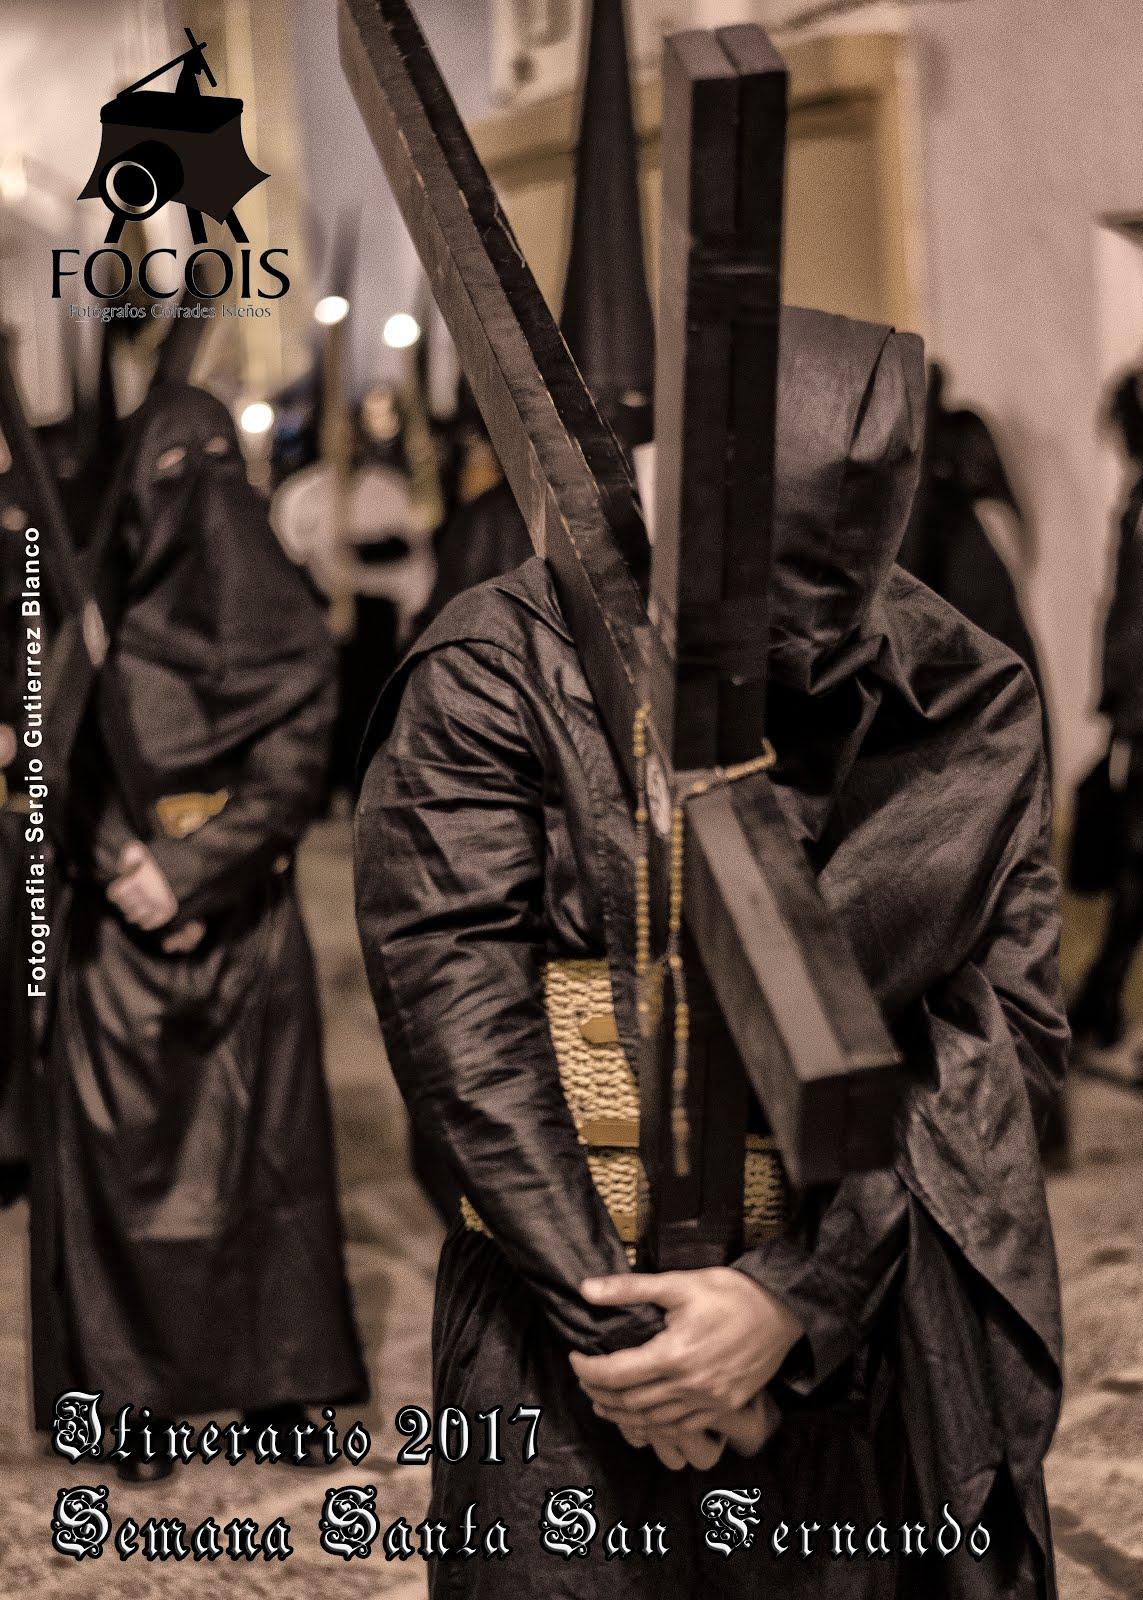 Itinerario Focois 2017